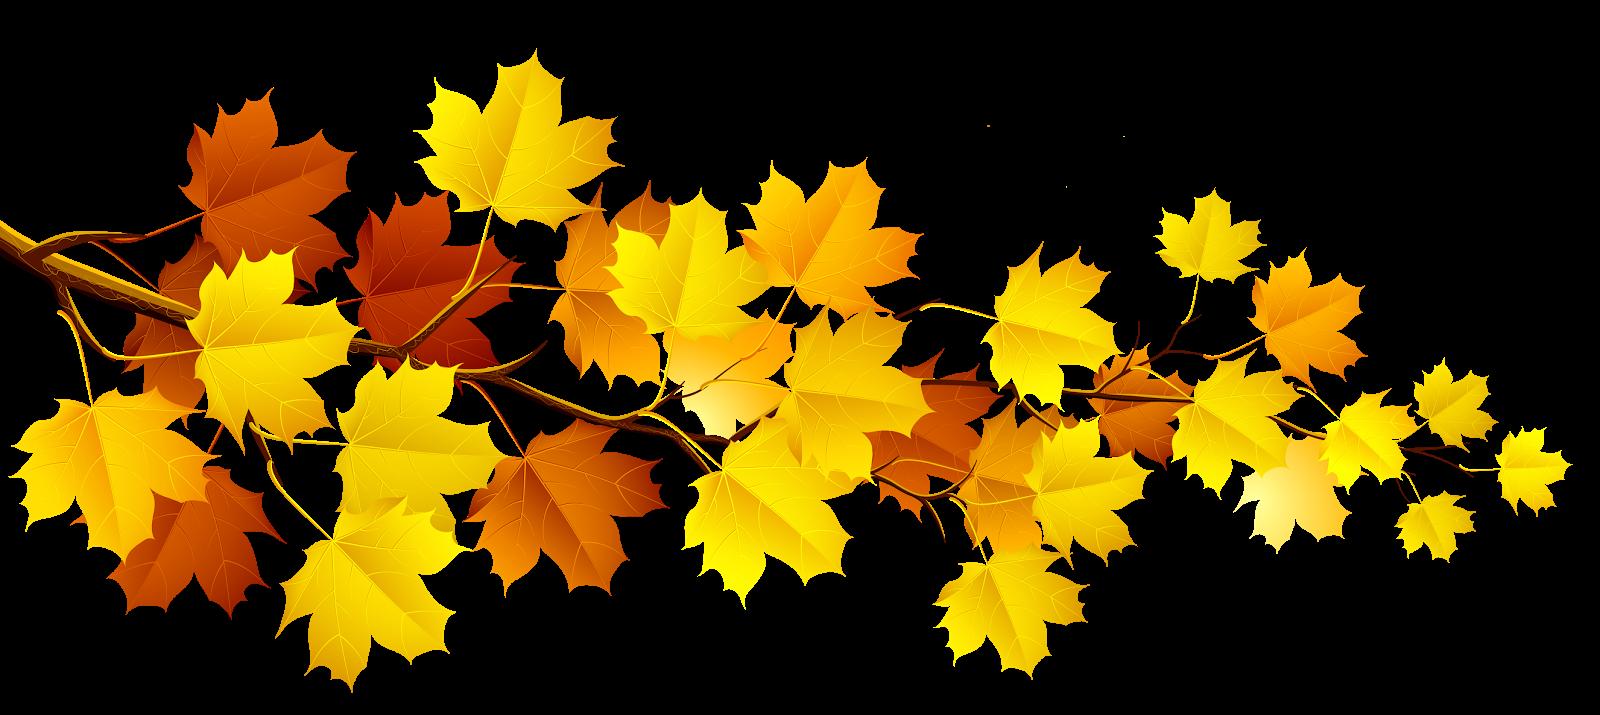 Картинки по запросу осінь клипарт